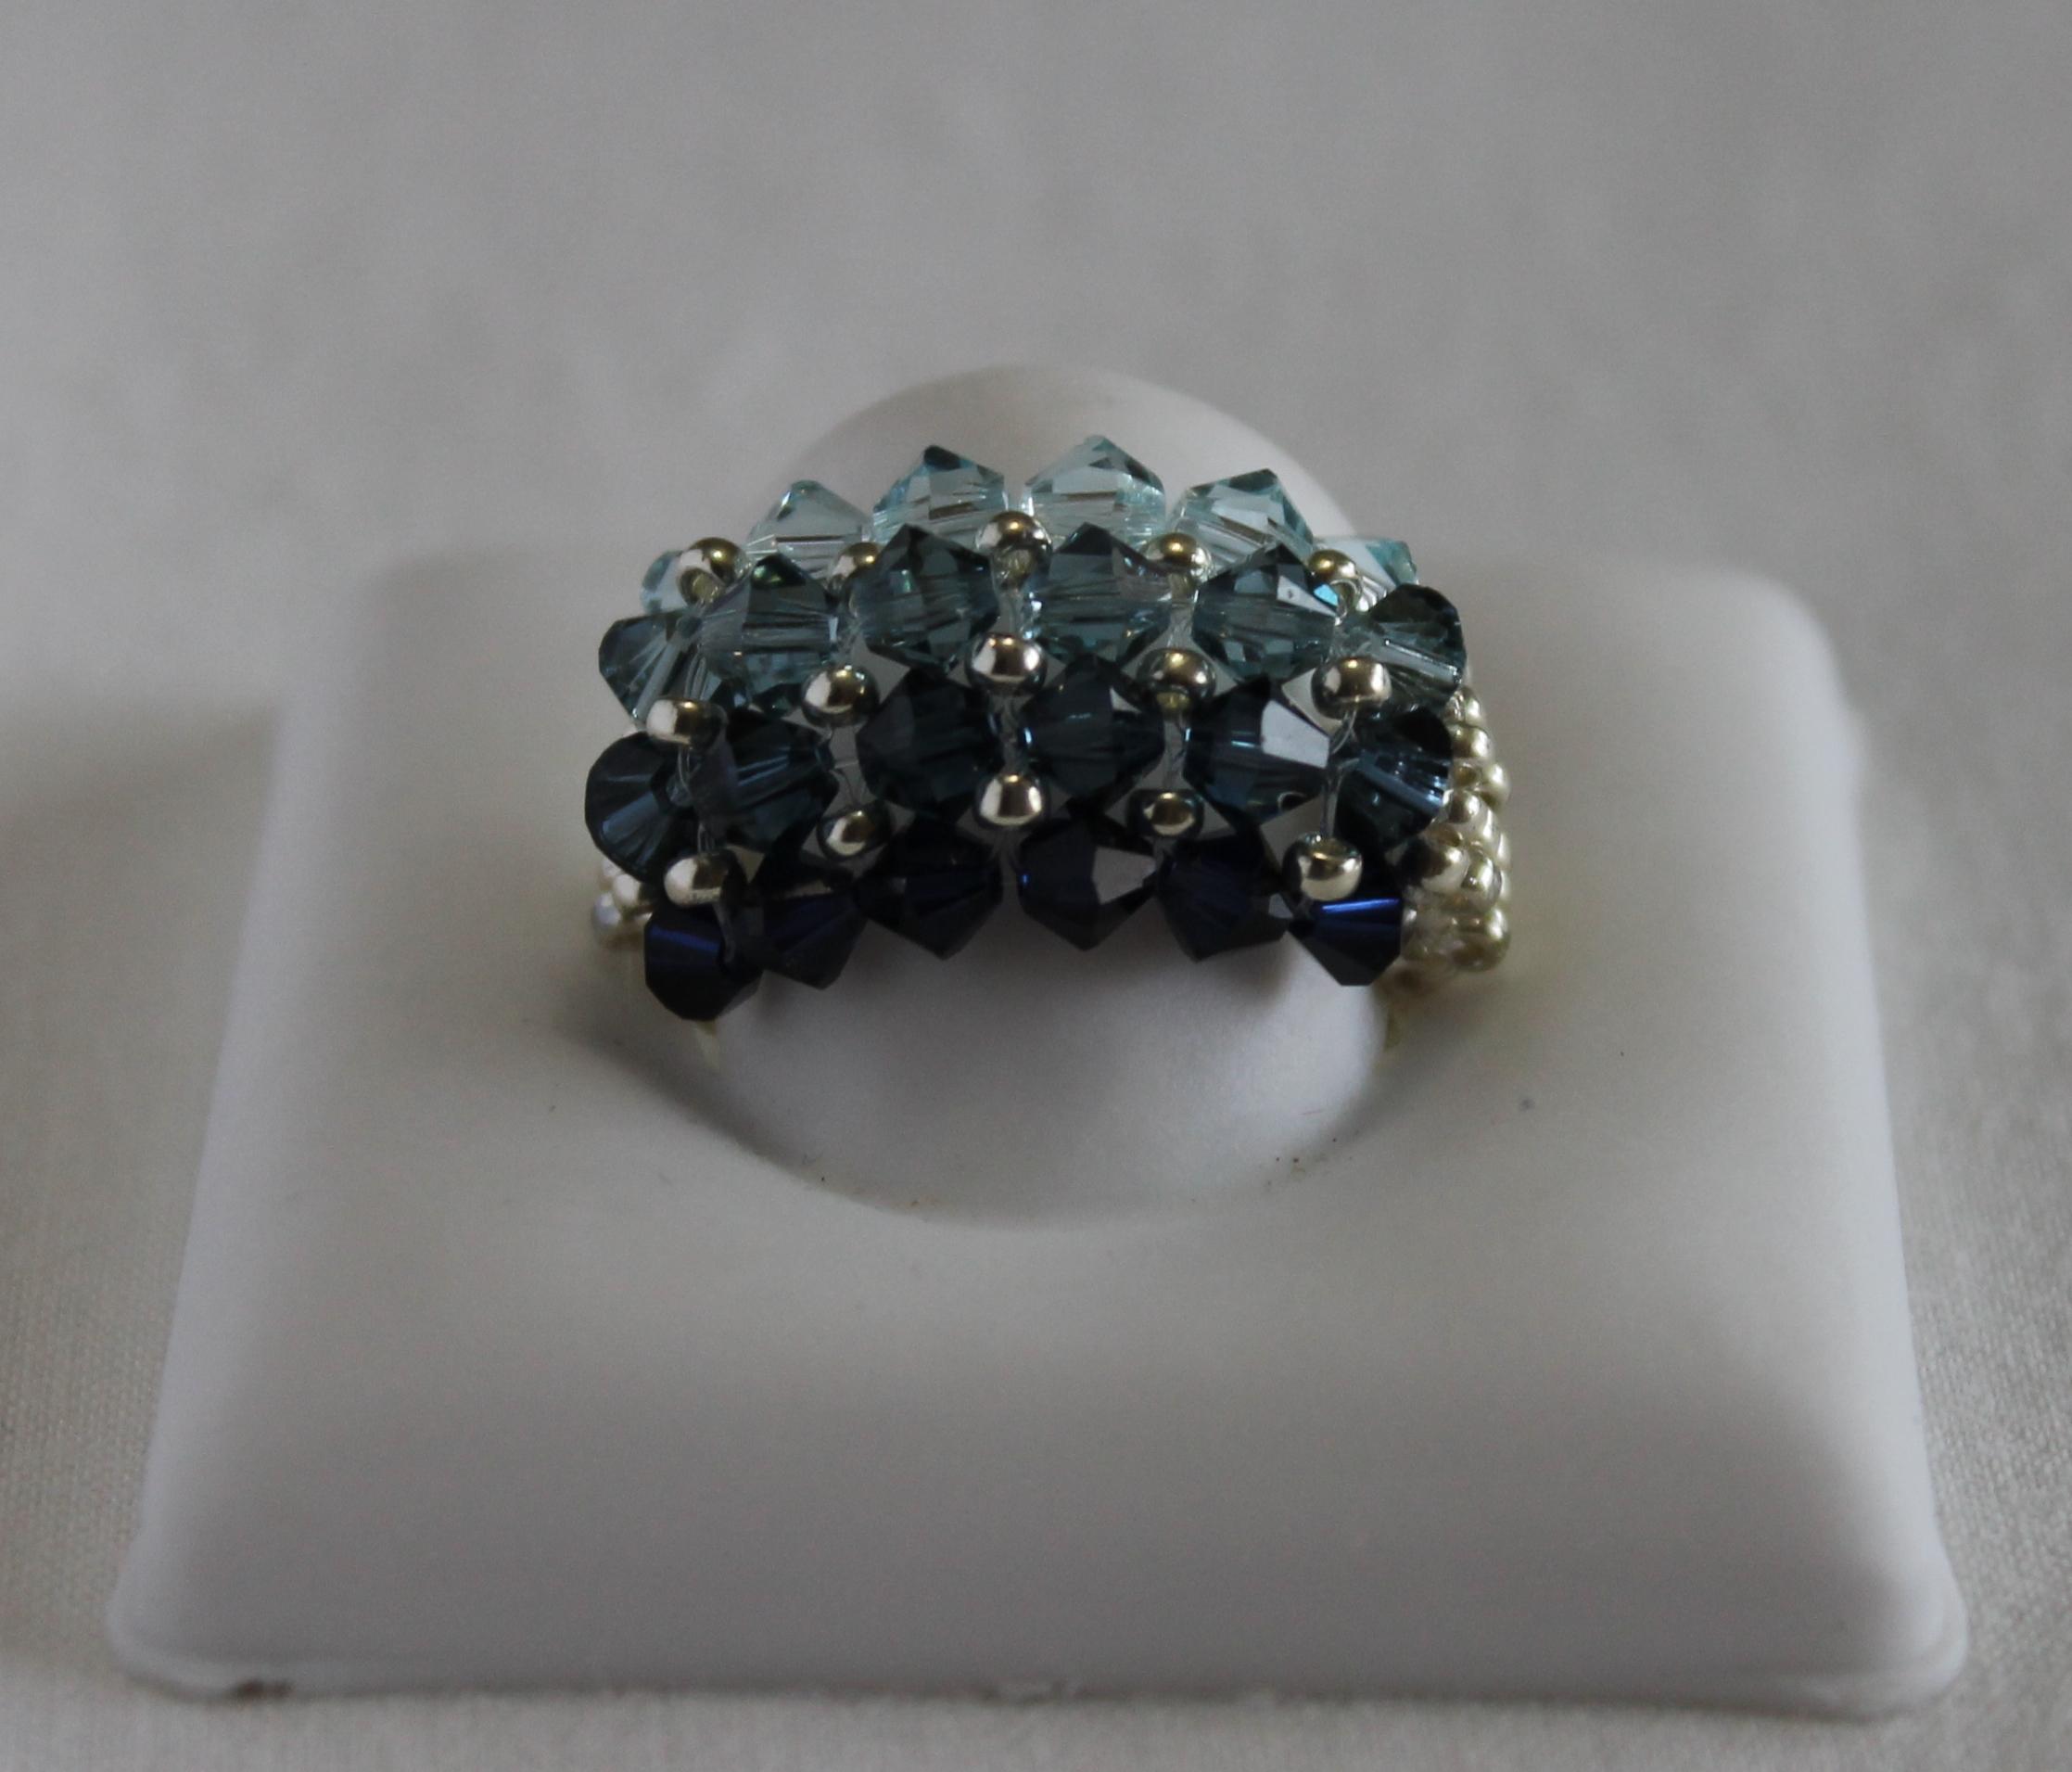 Swarovski ring blue ref a0103 alba 39 s jewelry online for Swarovski jewelry online store